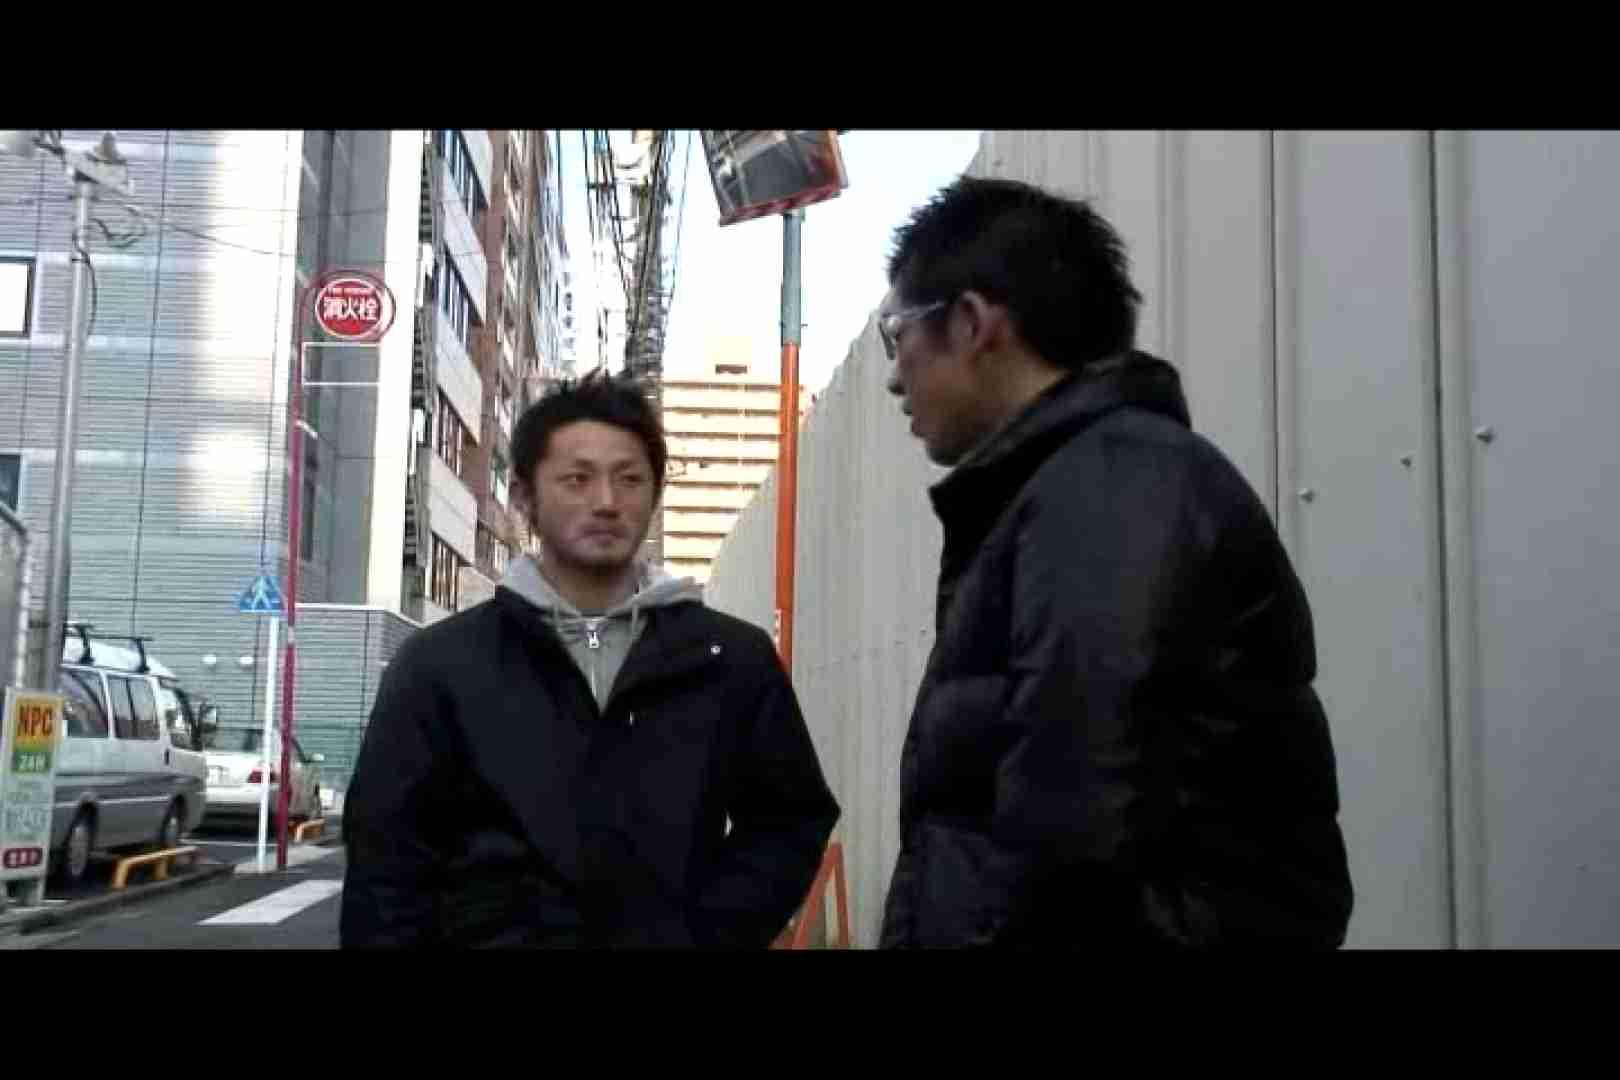 Bistro「イケメン」~Mokkori和風仕立て~vol.01 ゲイのプレイ | イケメンたち  97枚 1